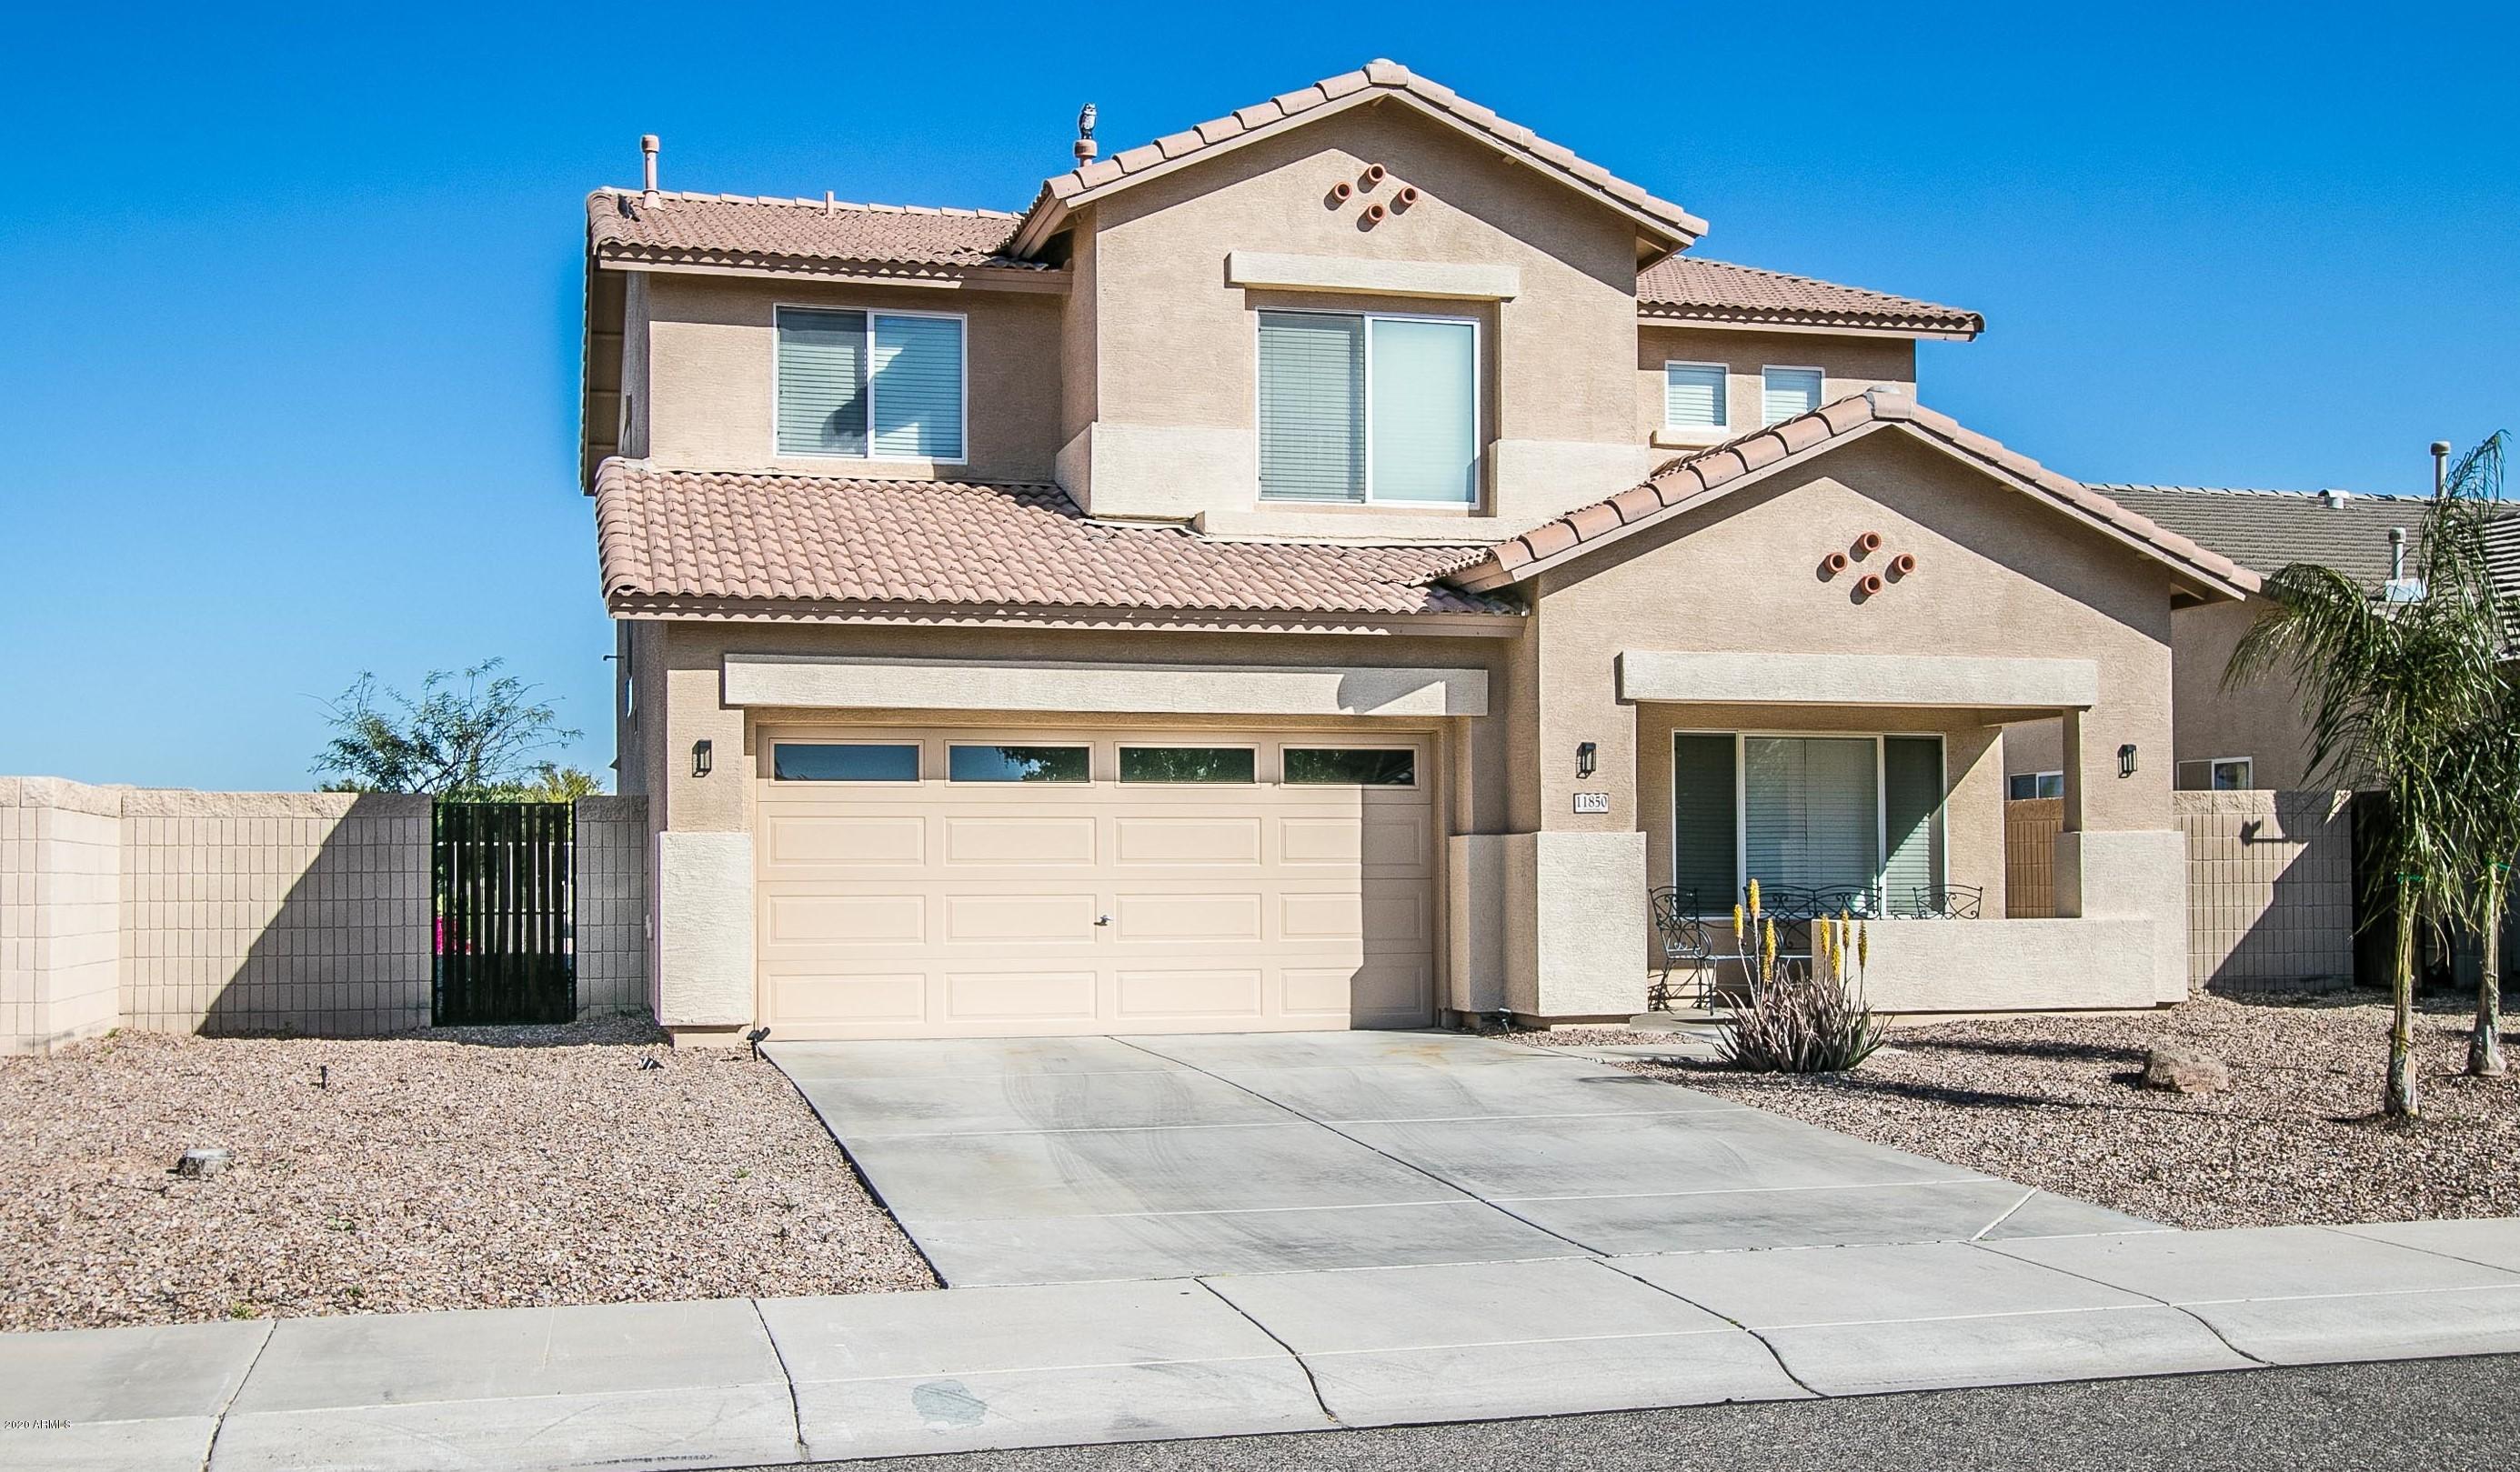 Photo of 11850 W WASHINGTON Street, Avondale, AZ 85323